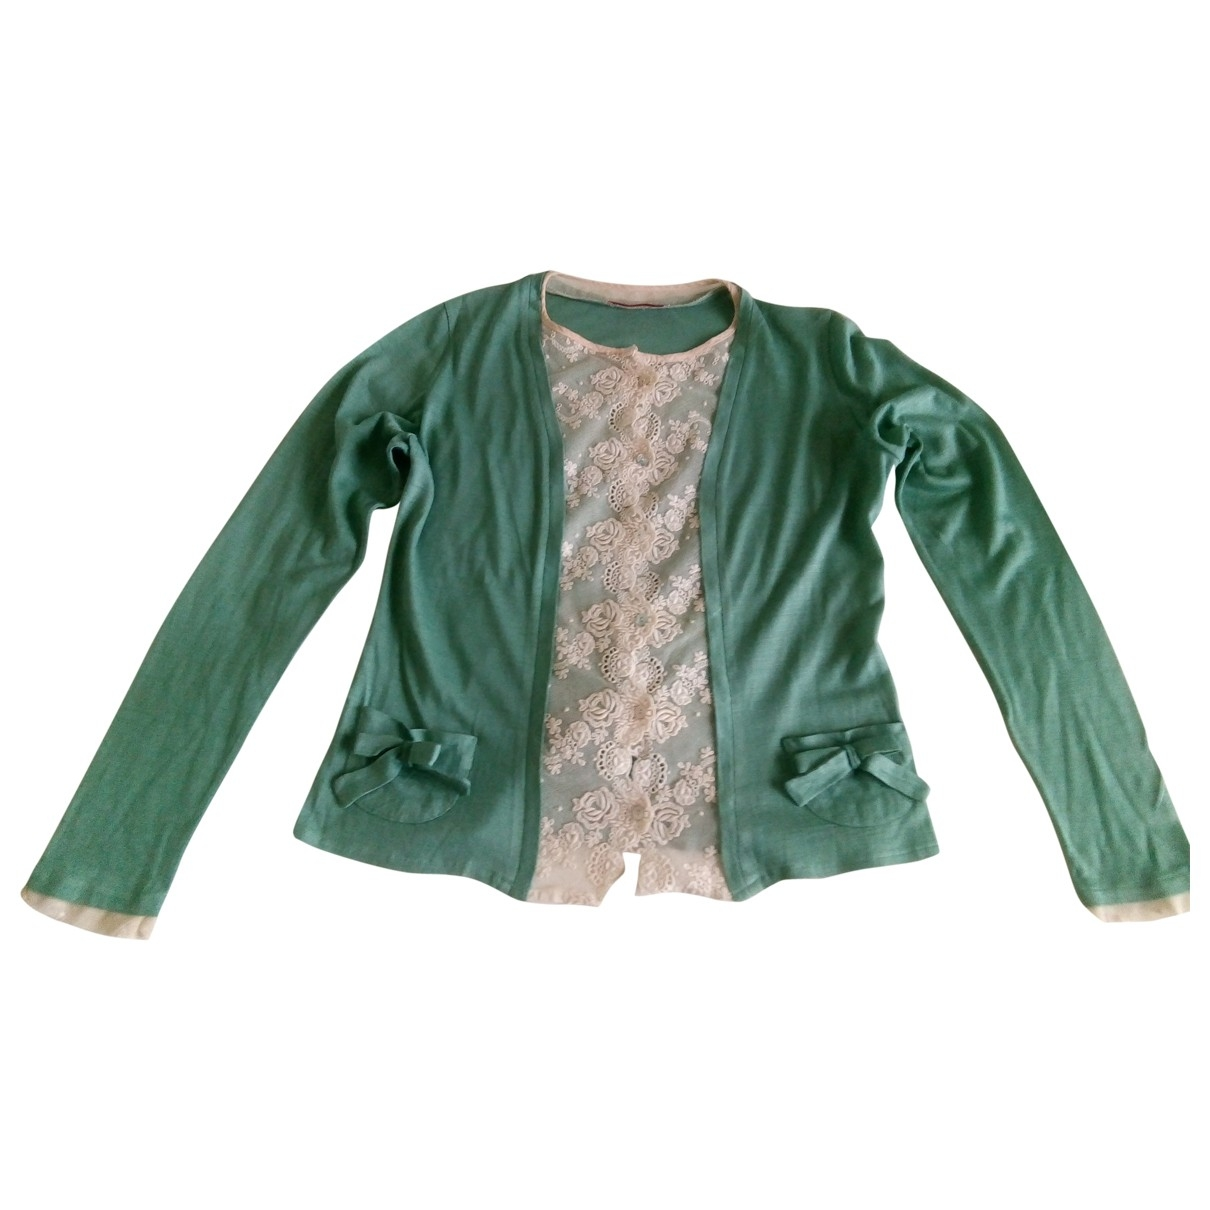 Maje \N Green Wool  top for Women 3 0-5